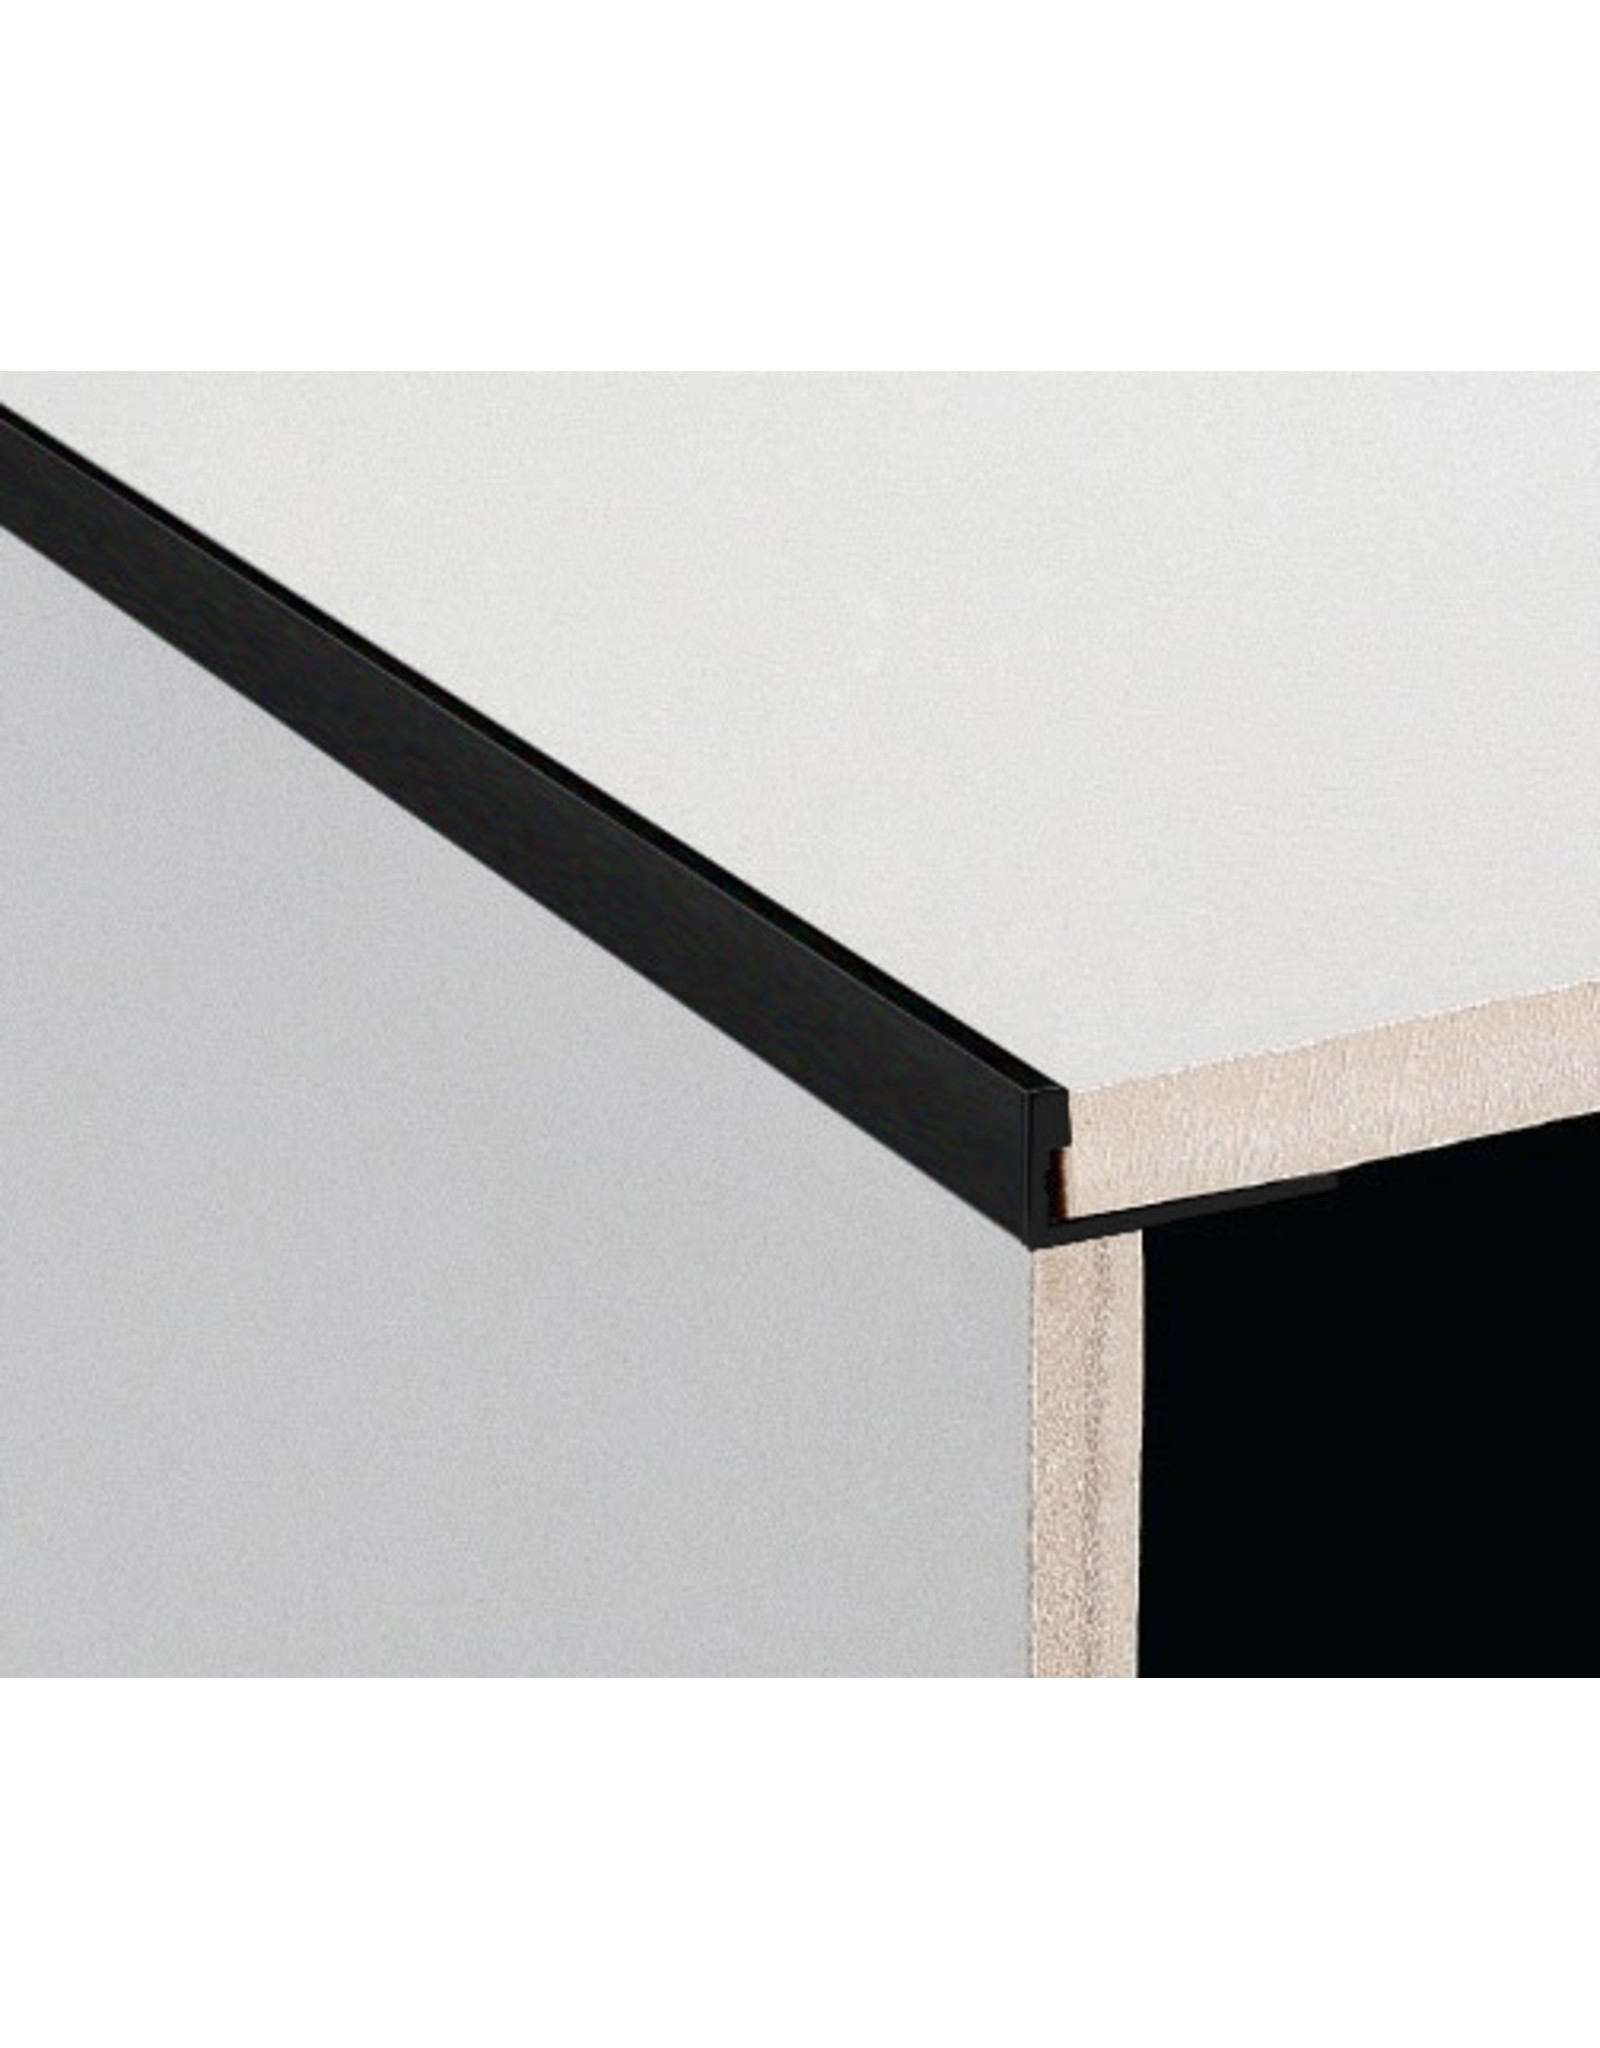 DTA 20mm DTA Aluminium L-Shape Trim Brushed Black